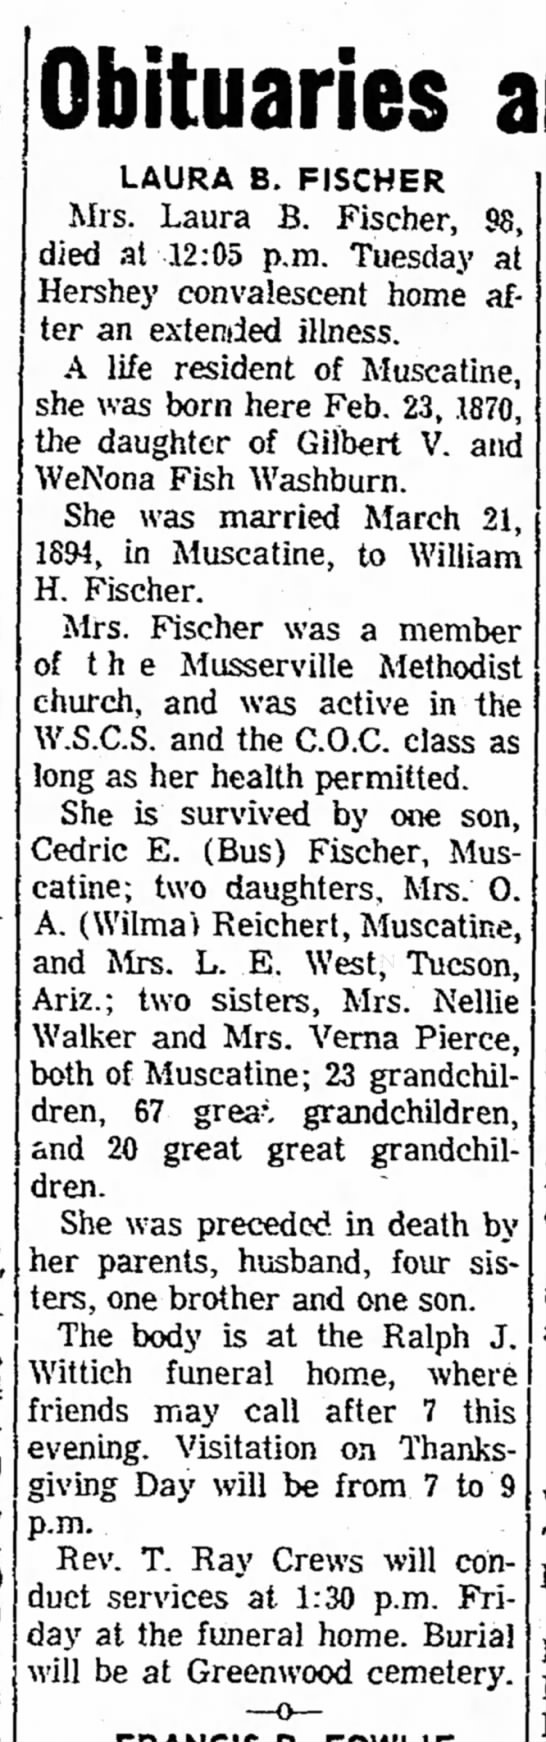 Laura Washburn Fischer obit - Obituaries LAURA B. FISCHER Mrs. Laura B....